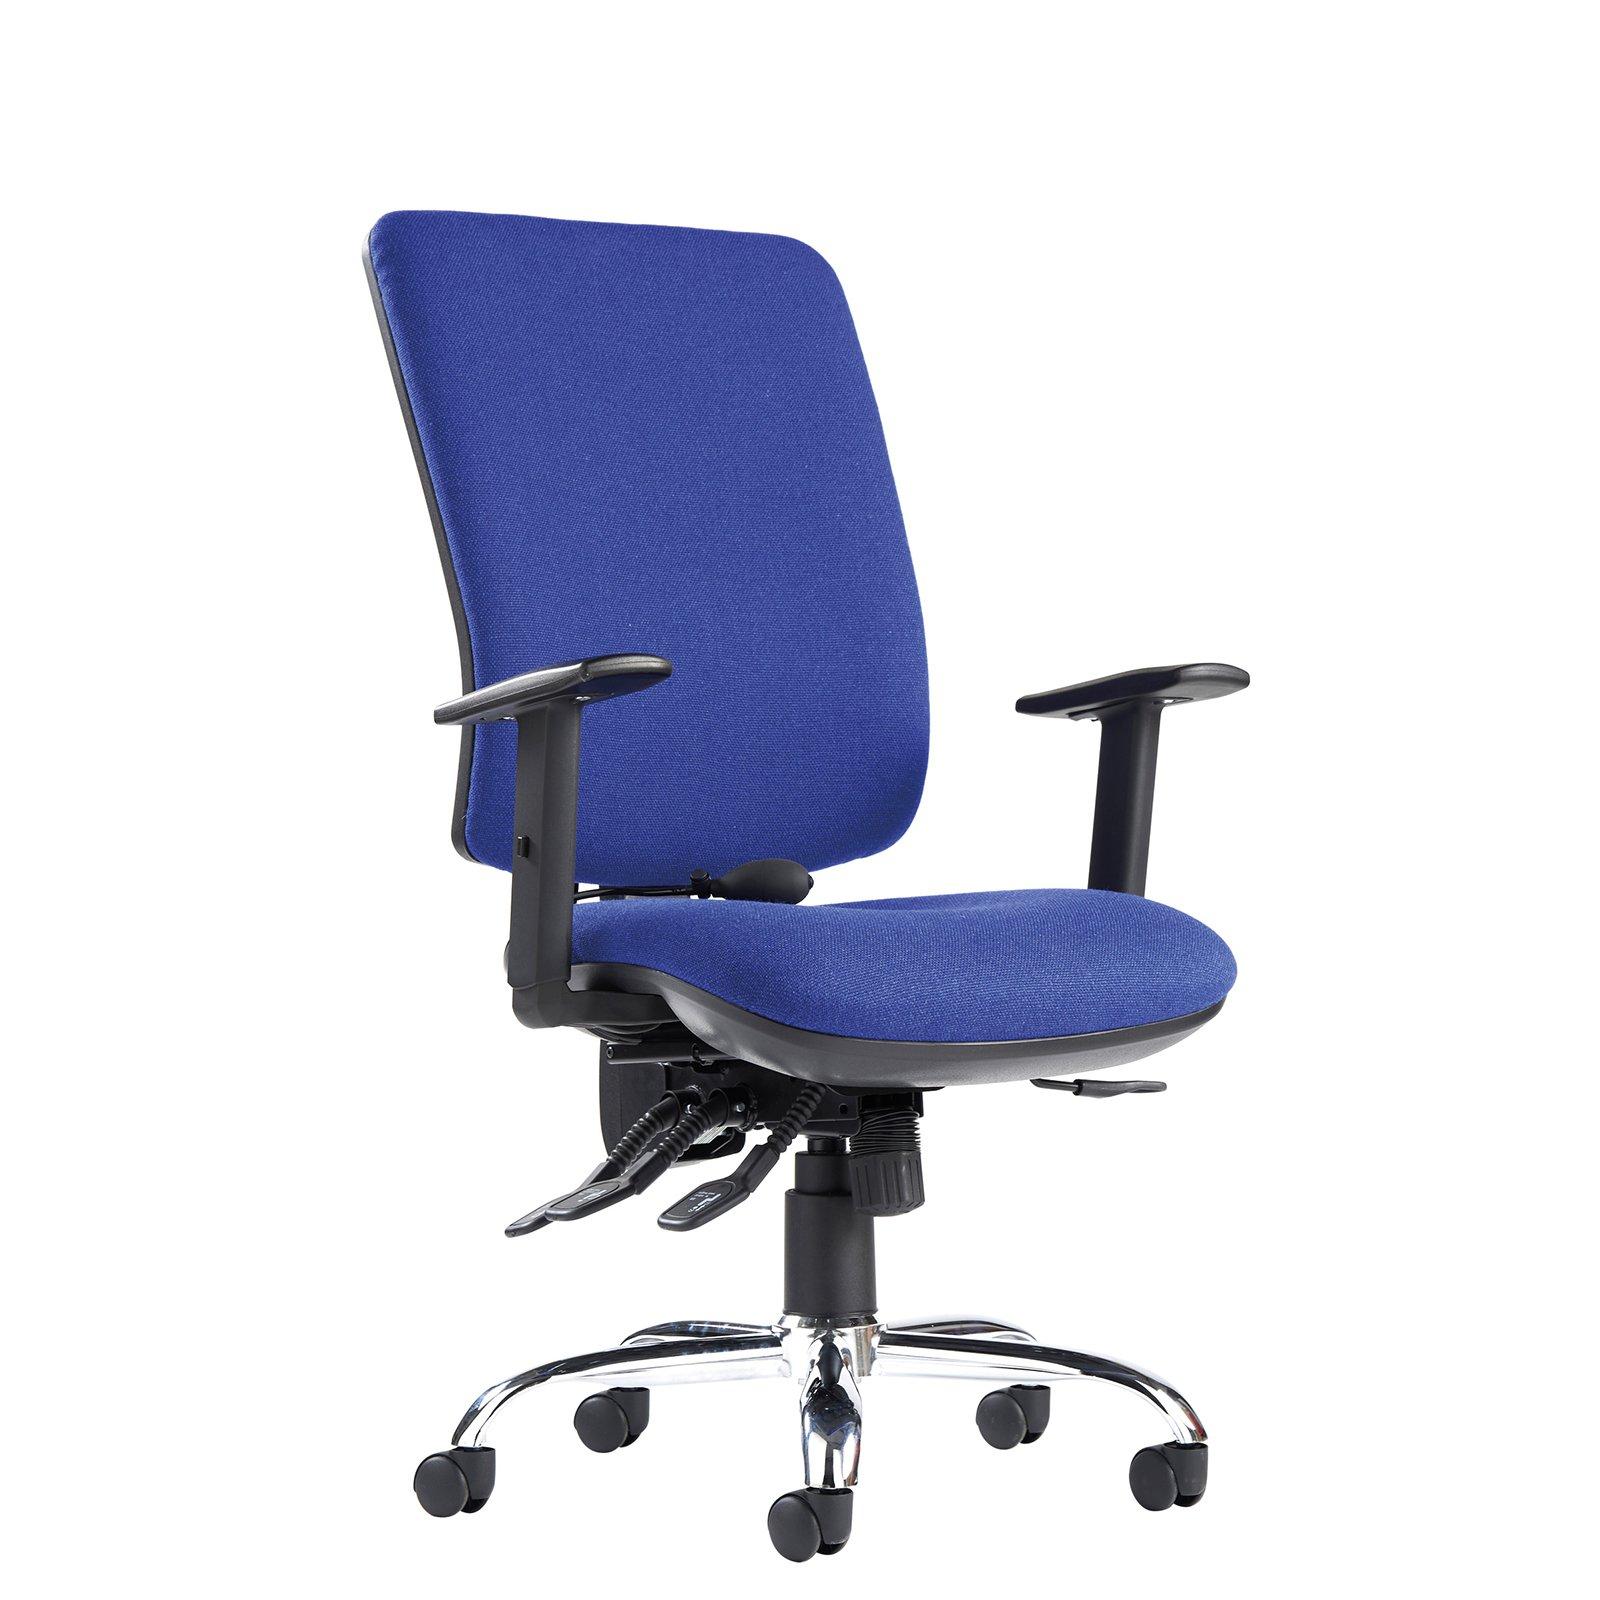 Senza Ergo 24Hr PCB Task Chair